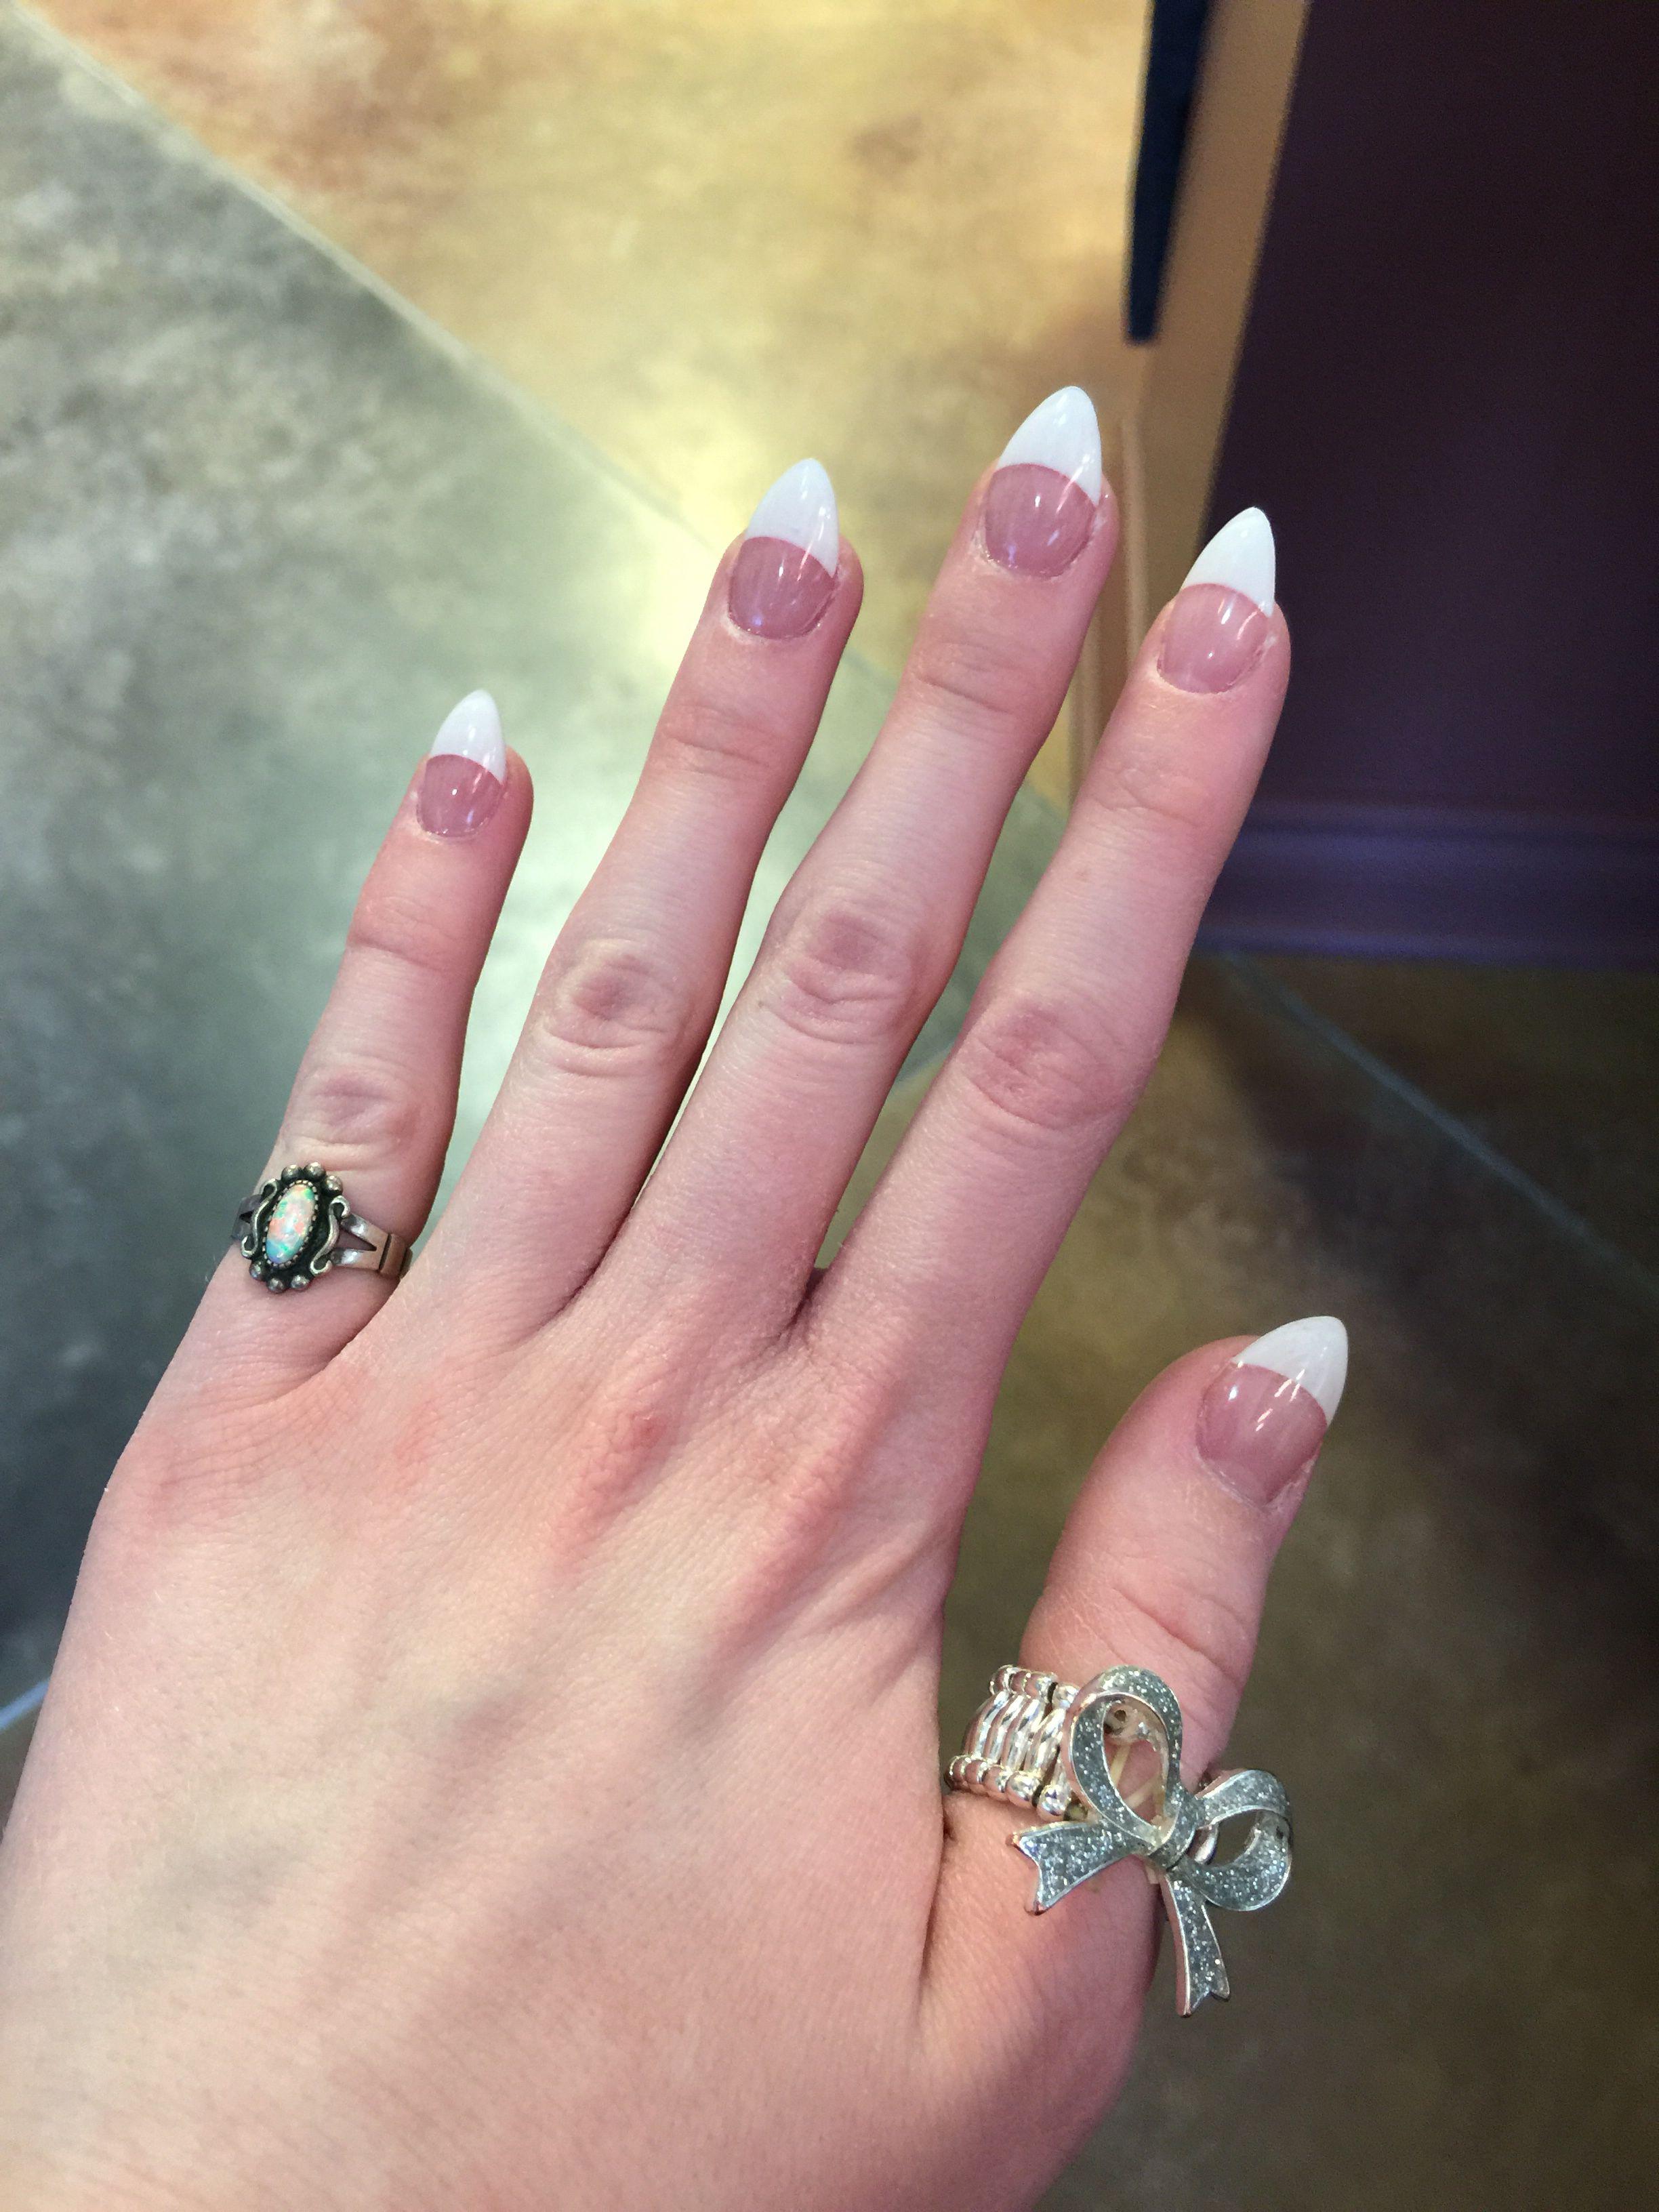 White tip French stiletto nails ❤   Nails   Pinterest   Double team ...